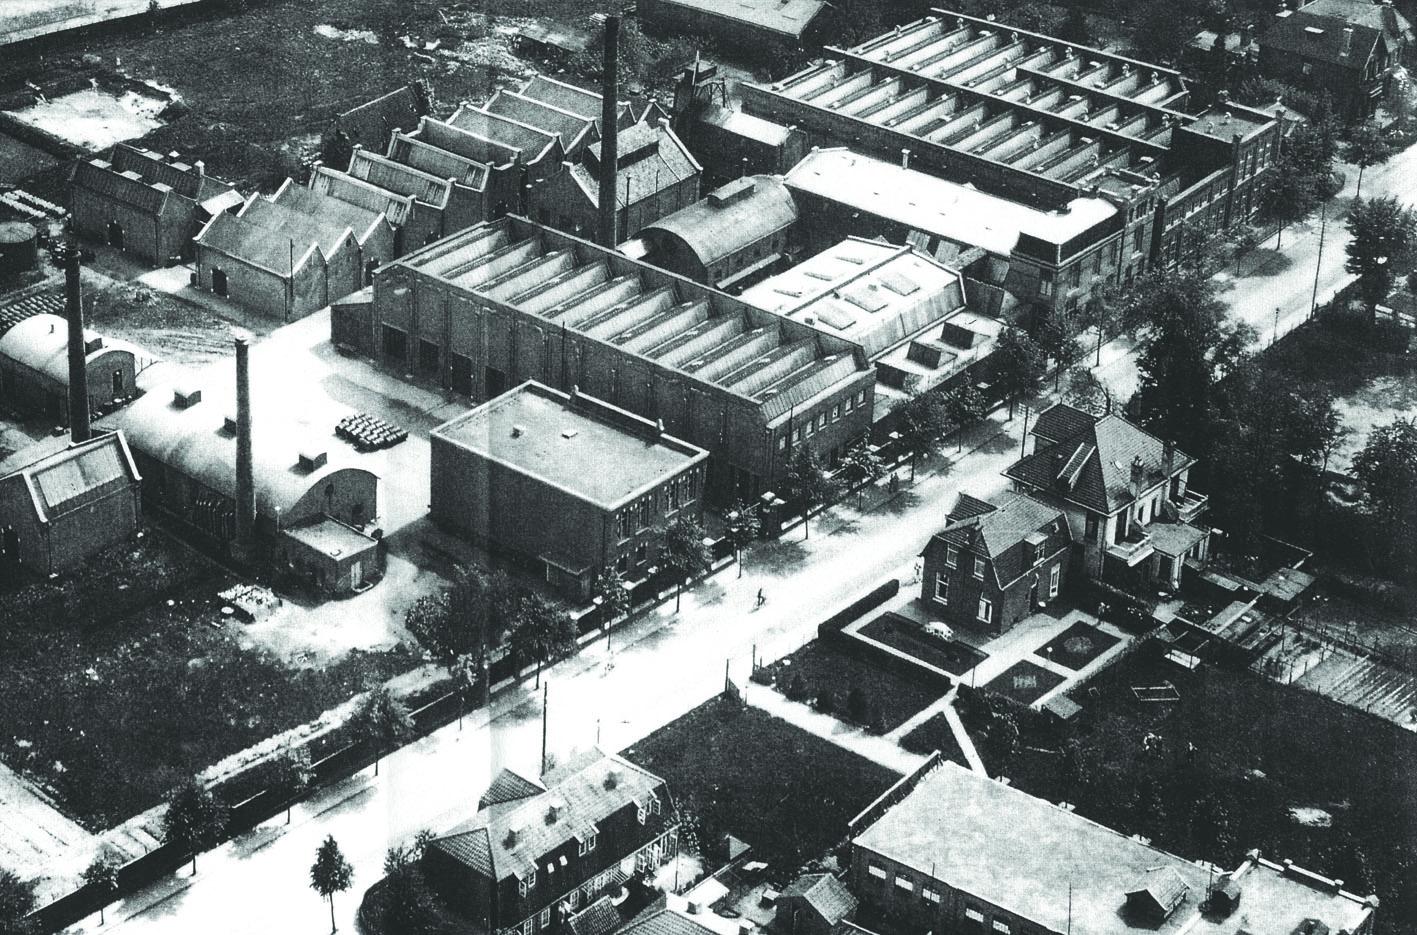 Lucent terrein Ripolin 1935 Hilversum Alliantie Atelier PUUUR